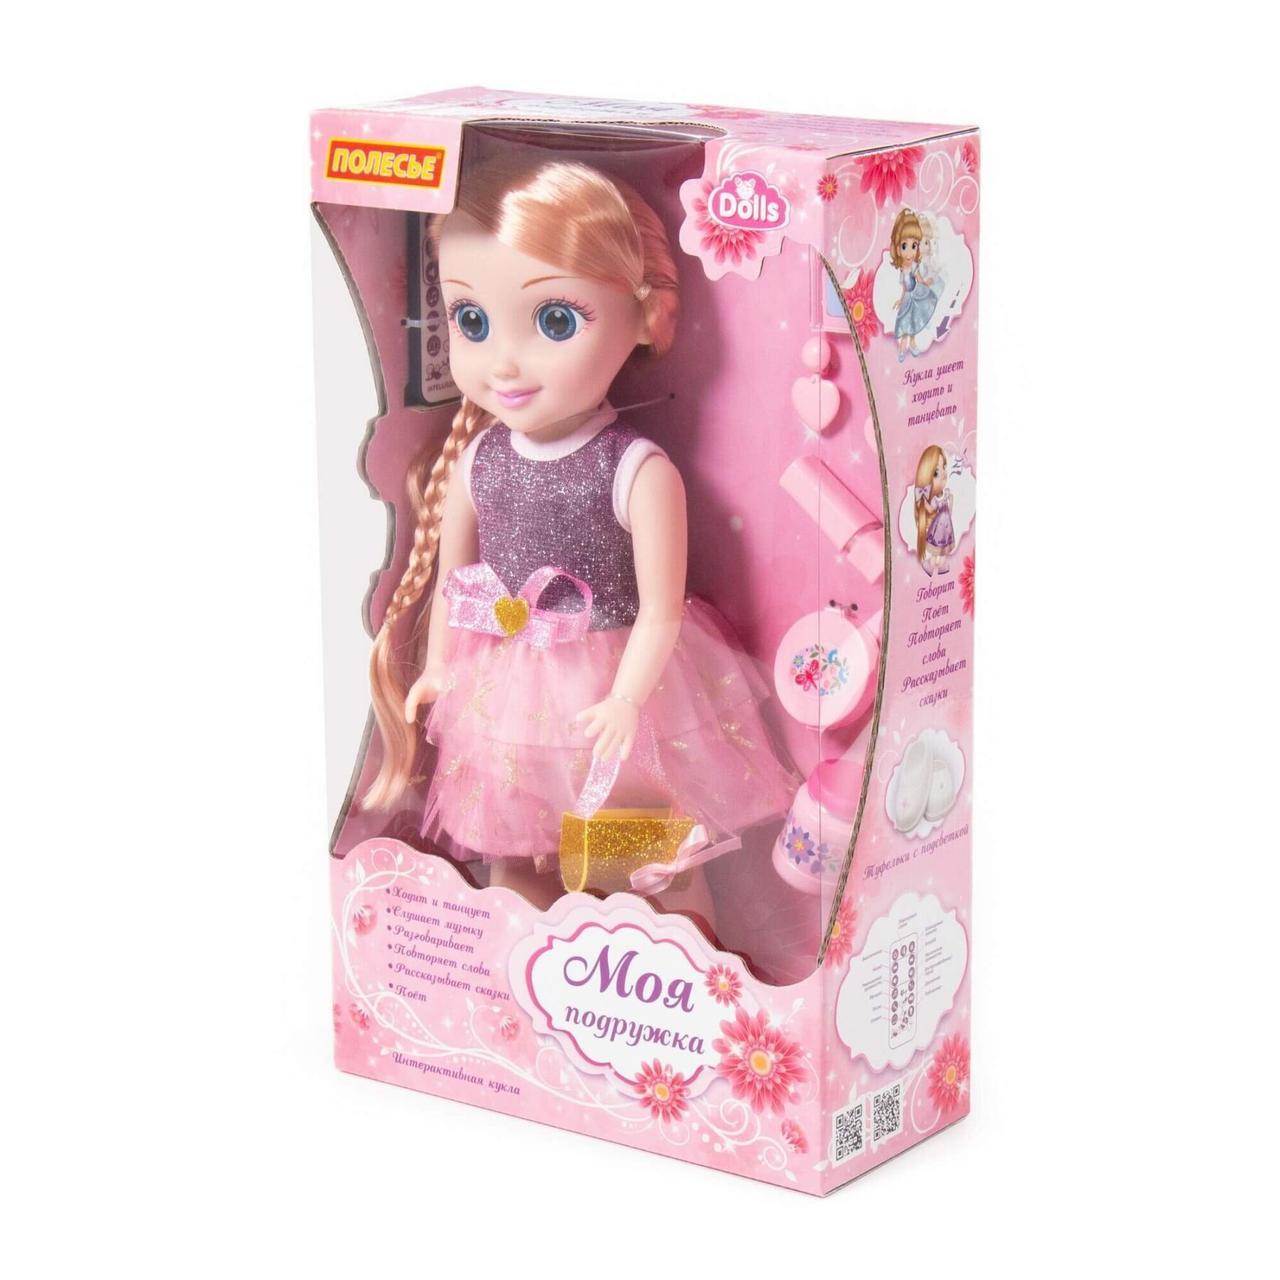 Кукла Милана 37см в салоне красоты с аксессуарами 79282